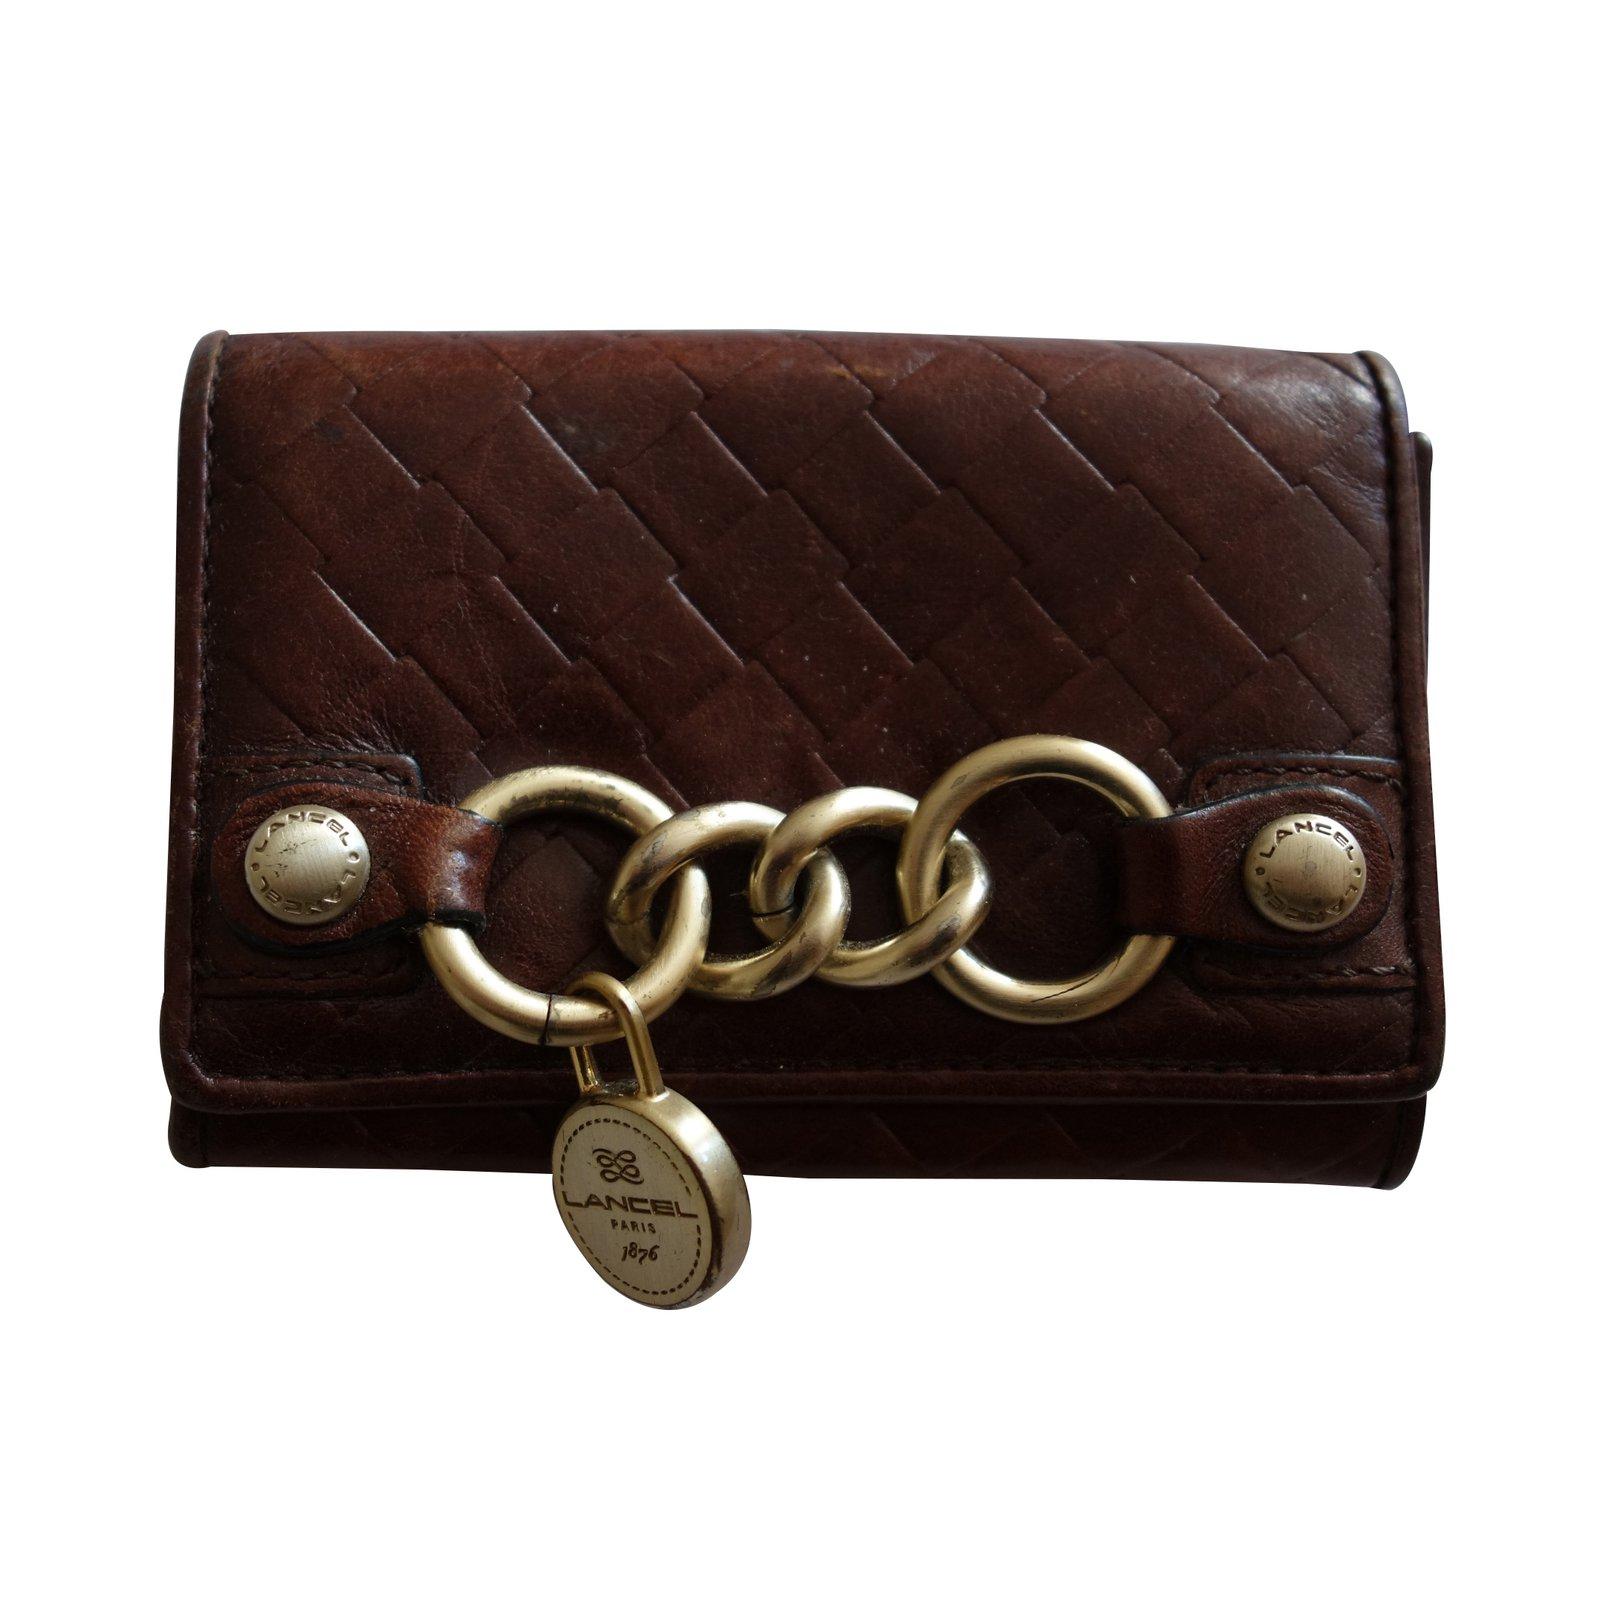 petite maroquinerie lancel porte monnaie en cuir cuir. Black Bedroom Furniture Sets. Home Design Ideas